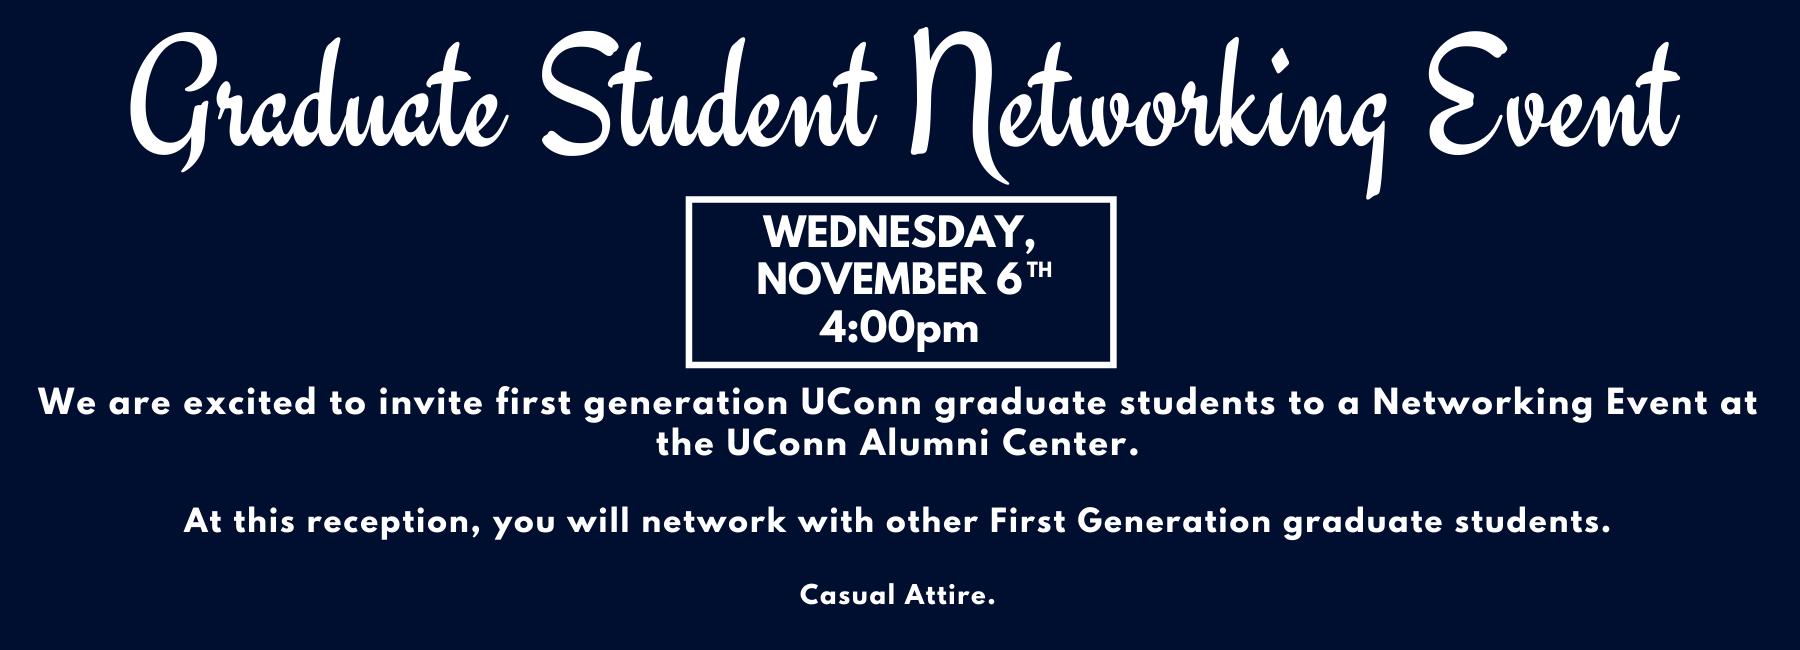 f 19 graduate student invitation